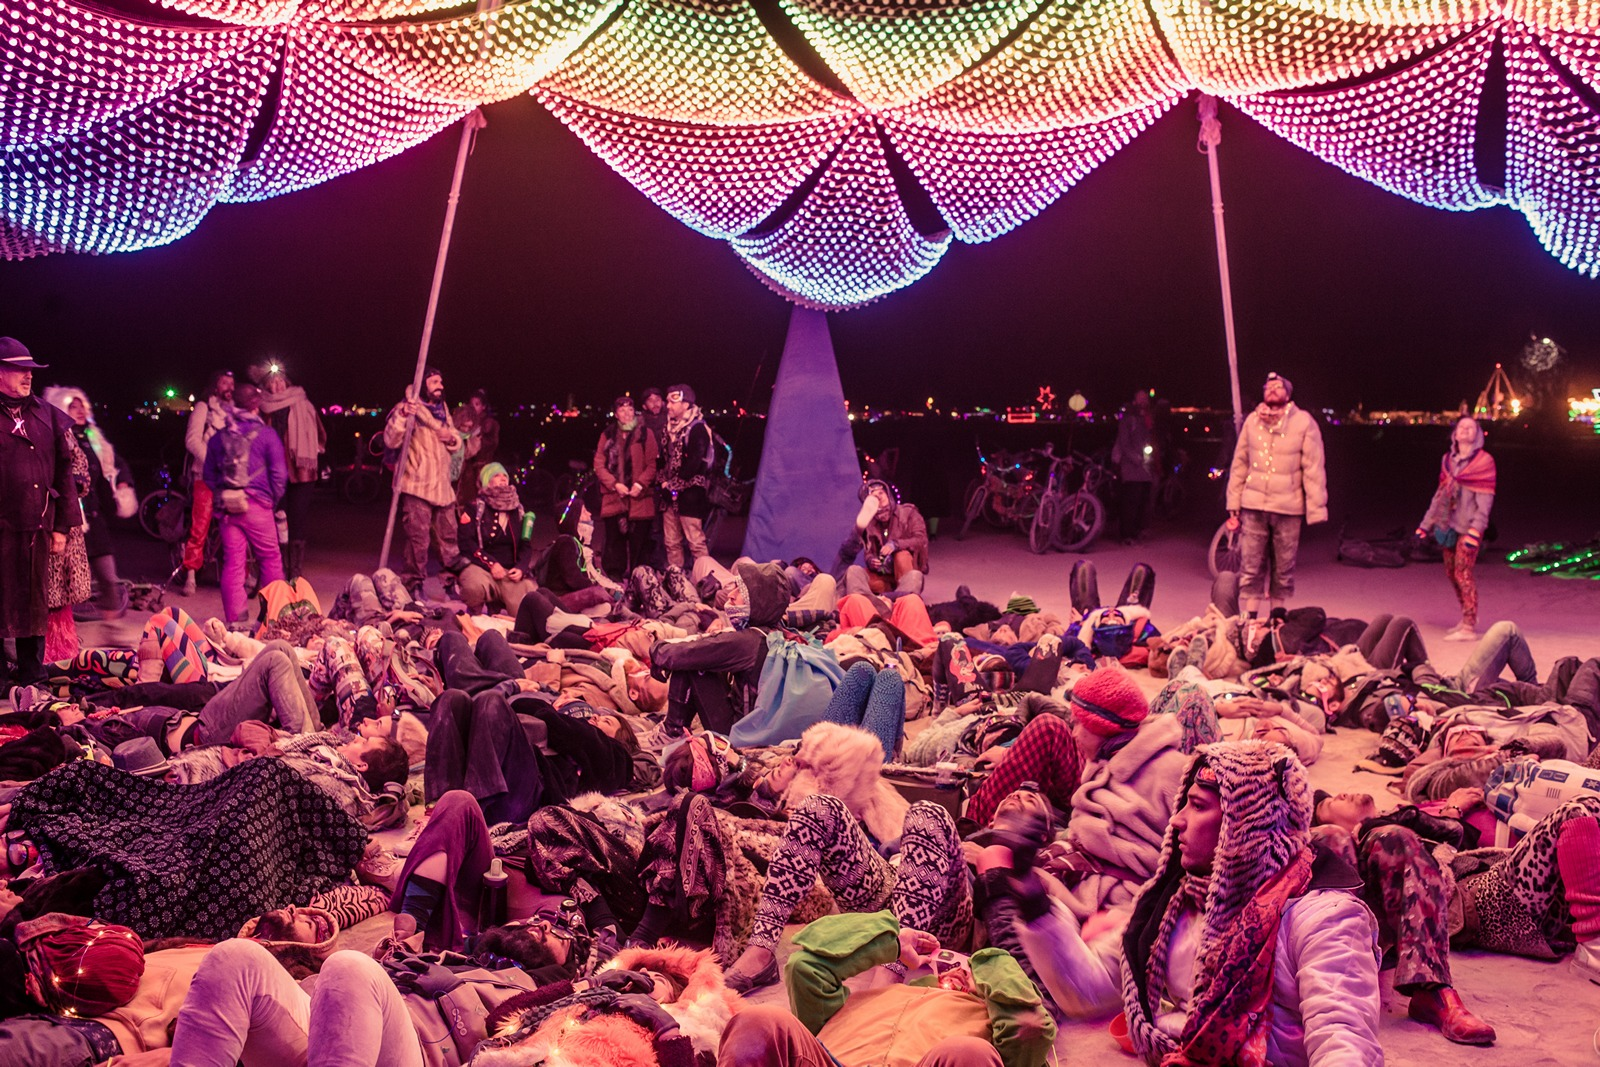 Burning Man - Relaxing watching changing lights